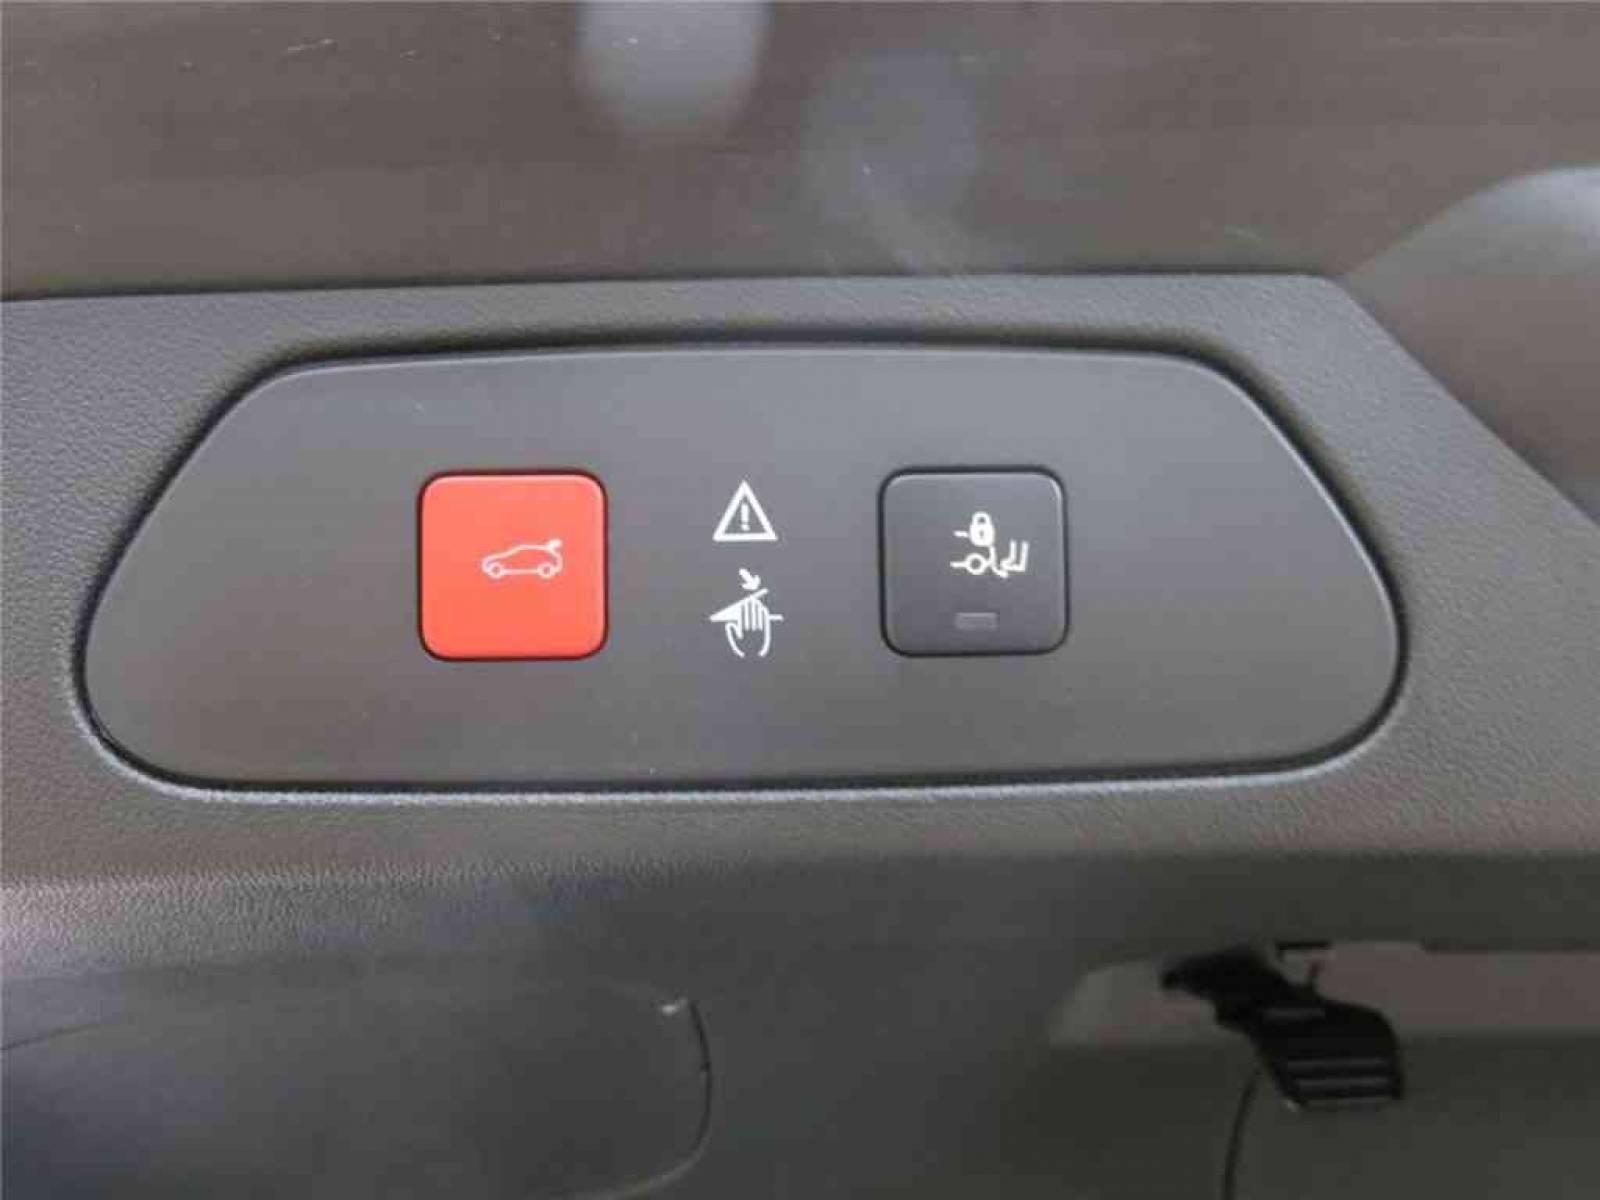 OPEL Grandland X 1.5 Diesel 130 ch BVA8 - véhicule d'occasion - Groupe Guillet - Opel Magicauto - Chalon-sur-Saône - 71380 - Saint-Marcel - 10